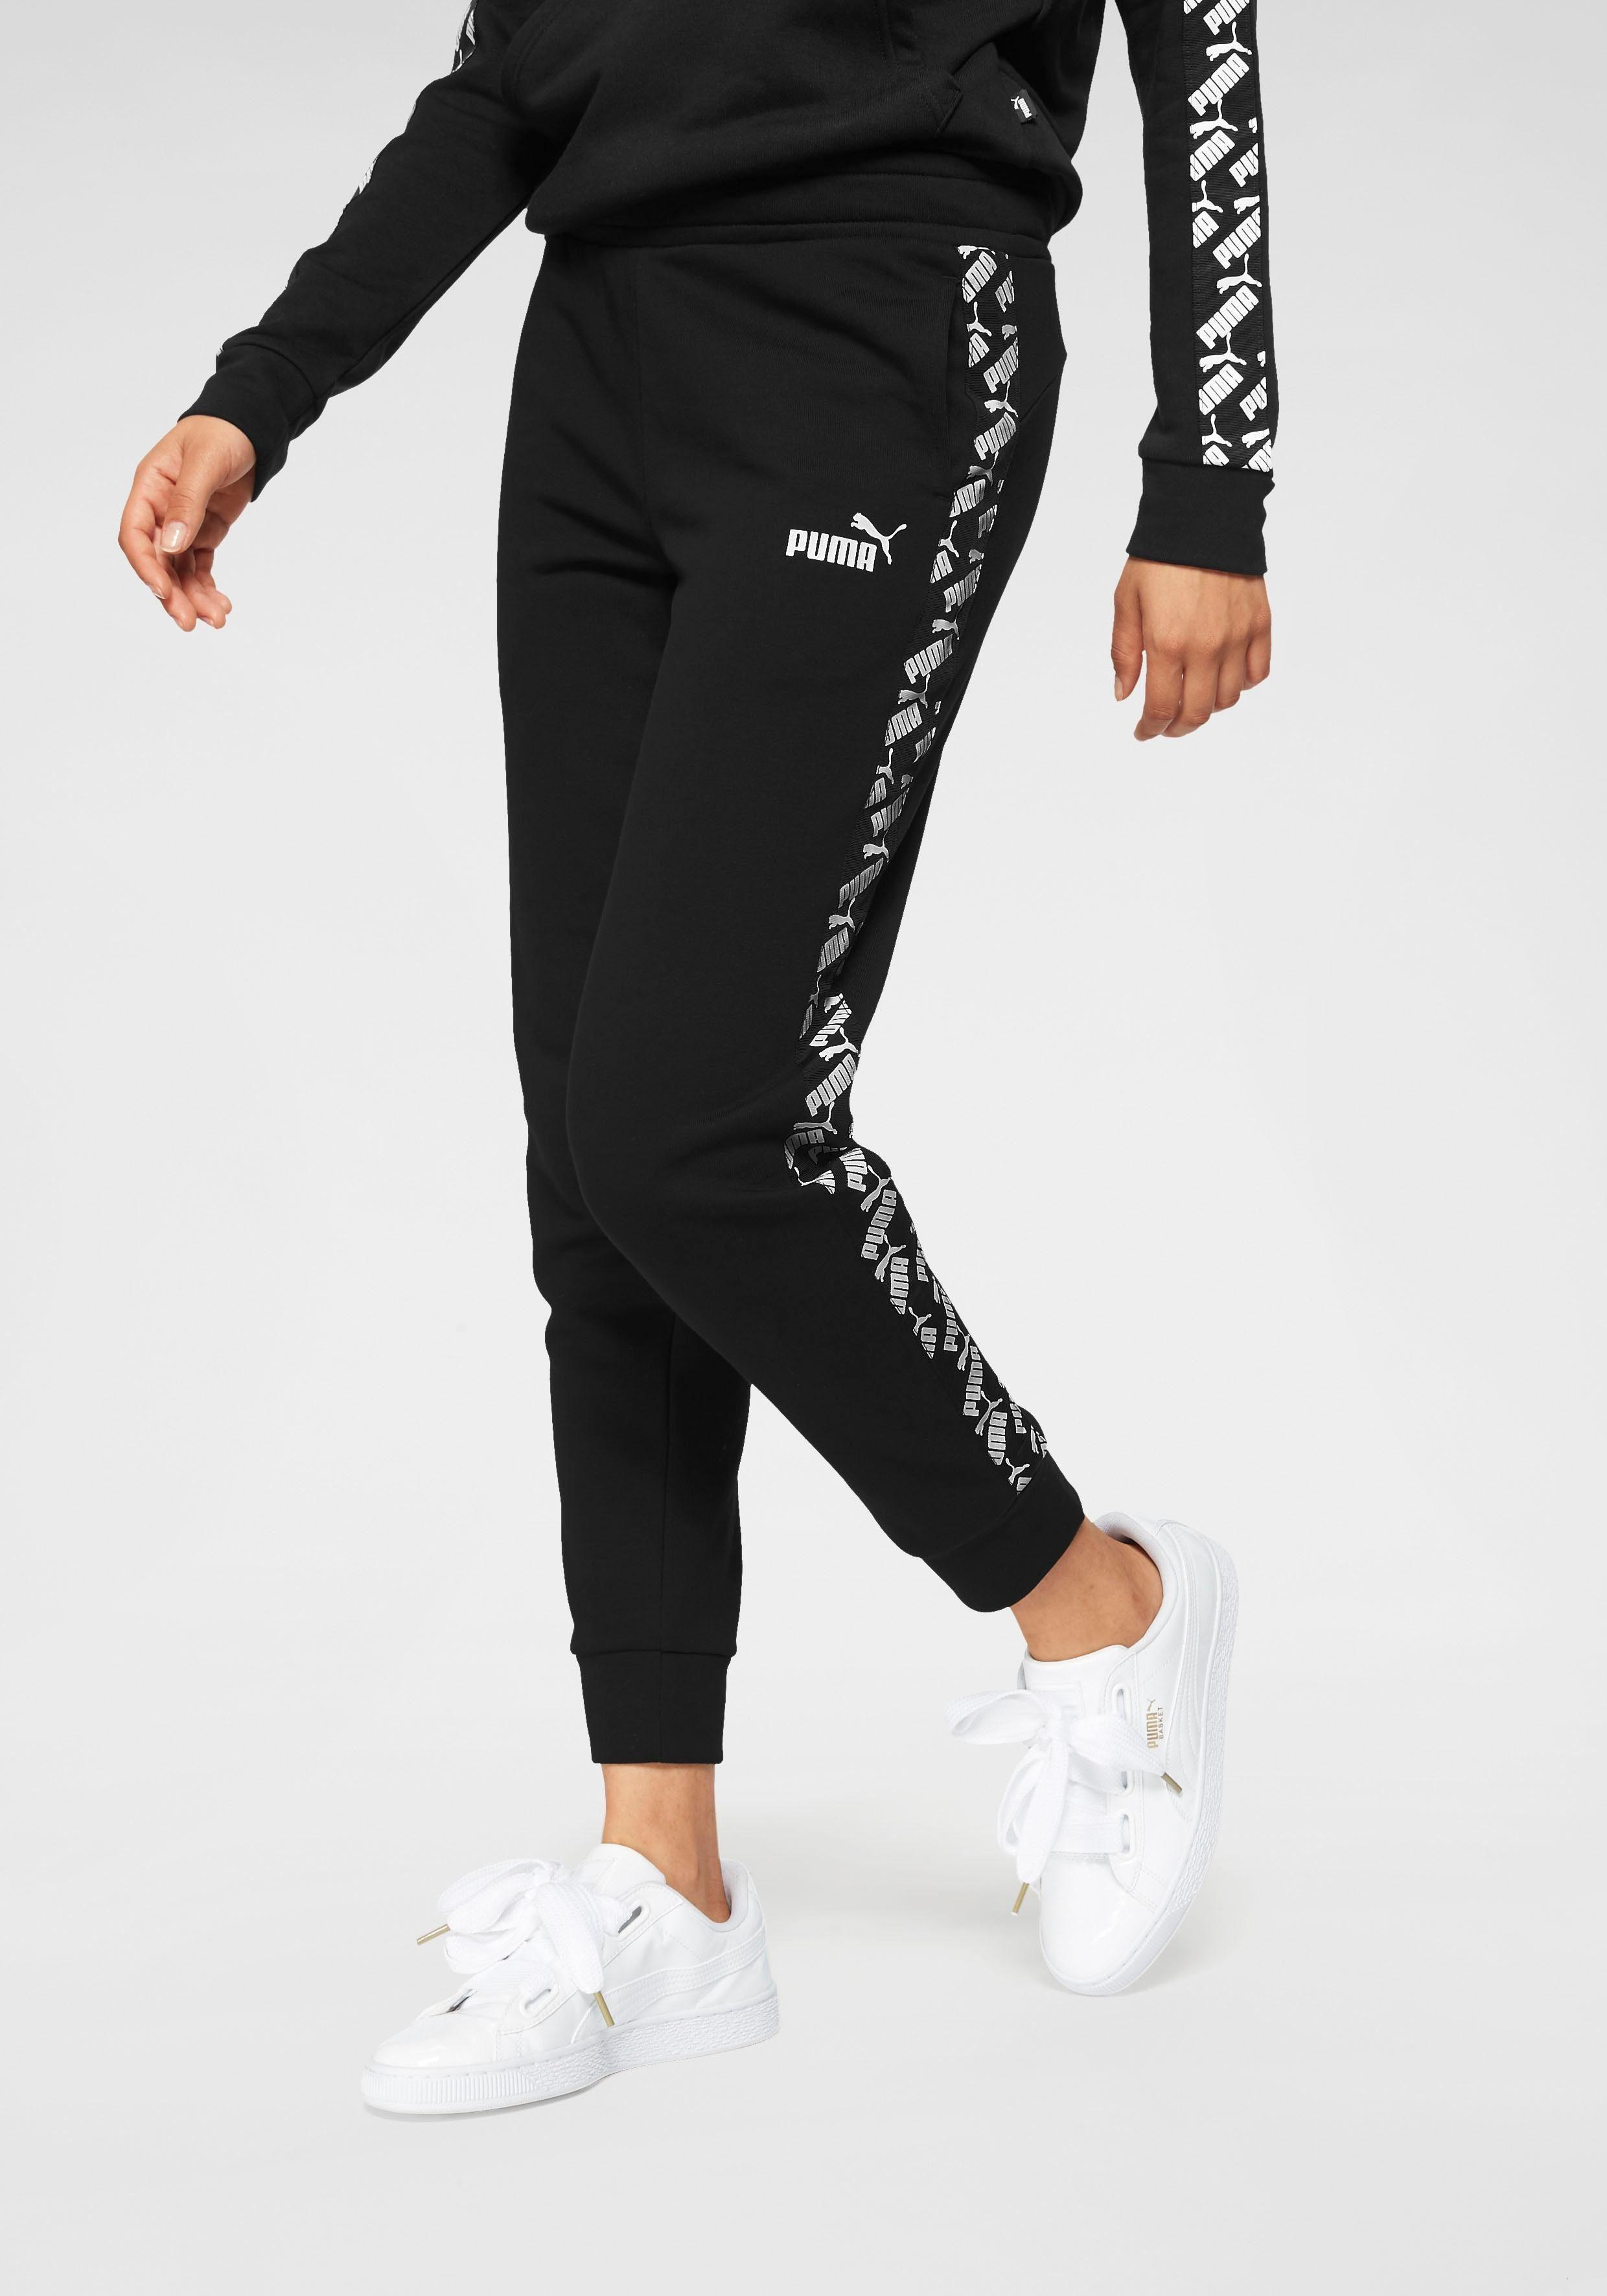 Puma Essential Ladies Ess Sweatpants Tr CL Trousers